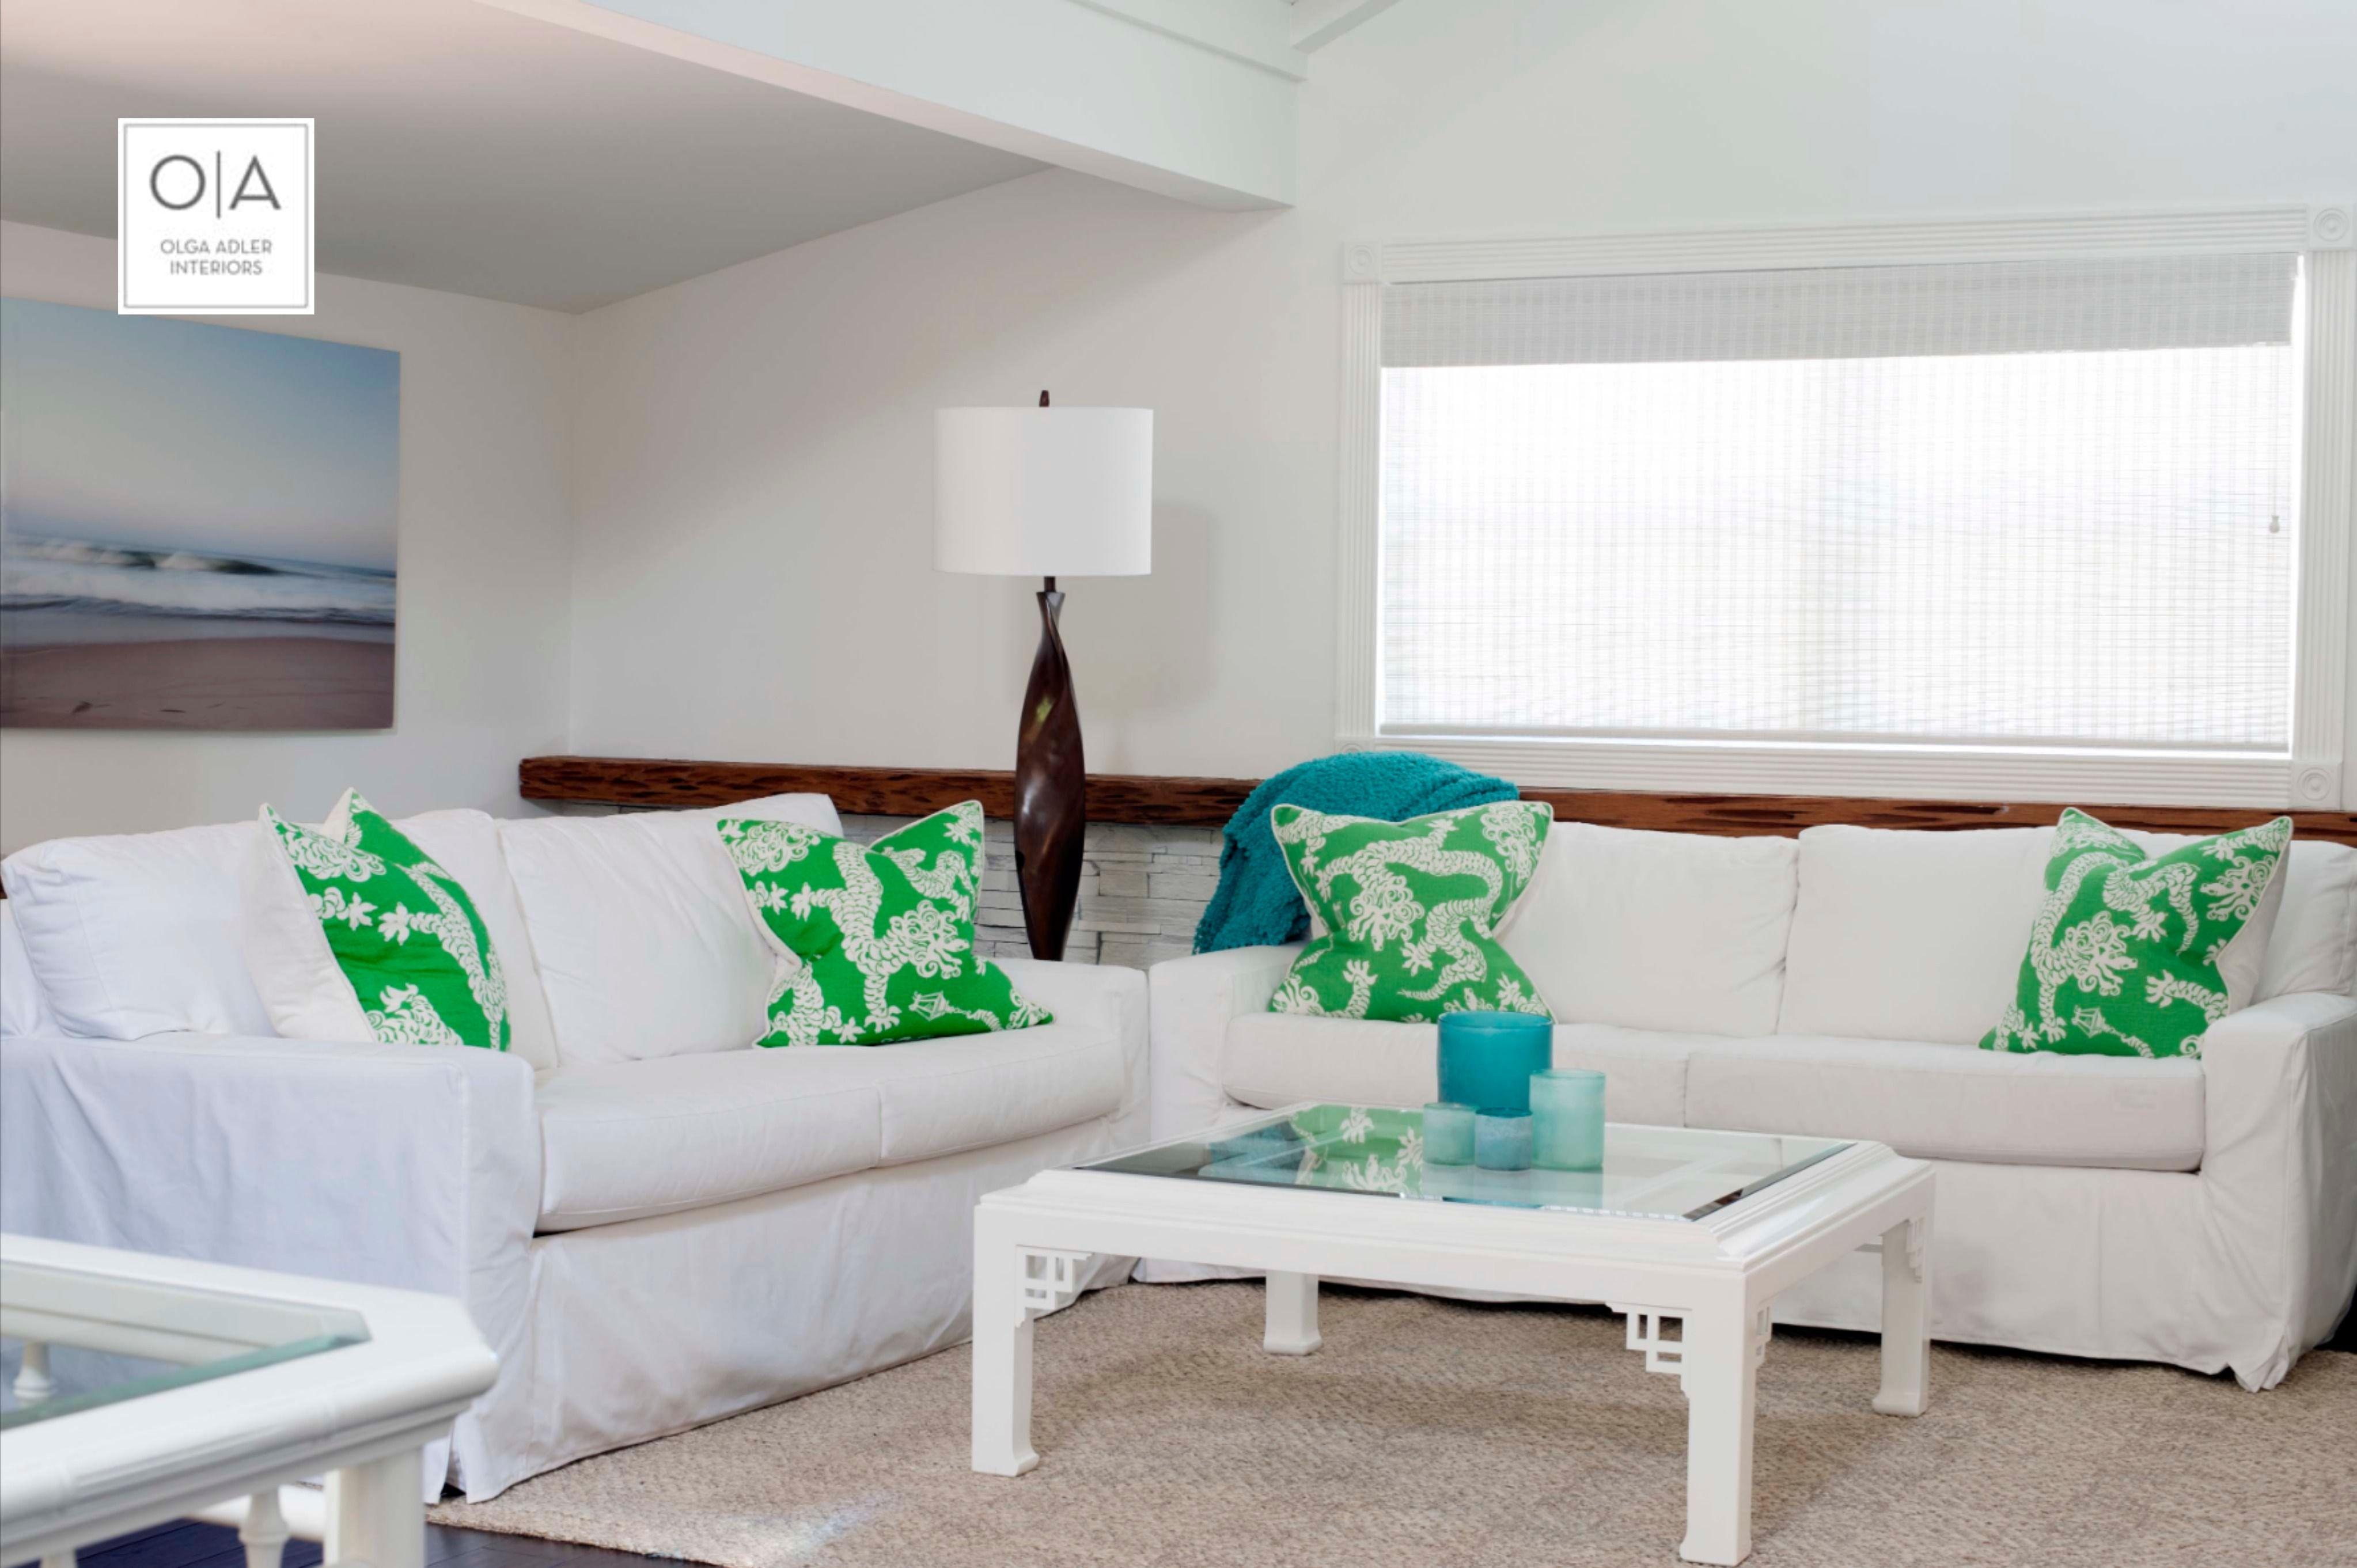 Delray Beach interior design - living room and home decoration created by interior designer, Olga Adler. #delraybeachinteriordesign #delraybeachinteriordesigner #floridainteriors #homedecor #delraybeach #florida